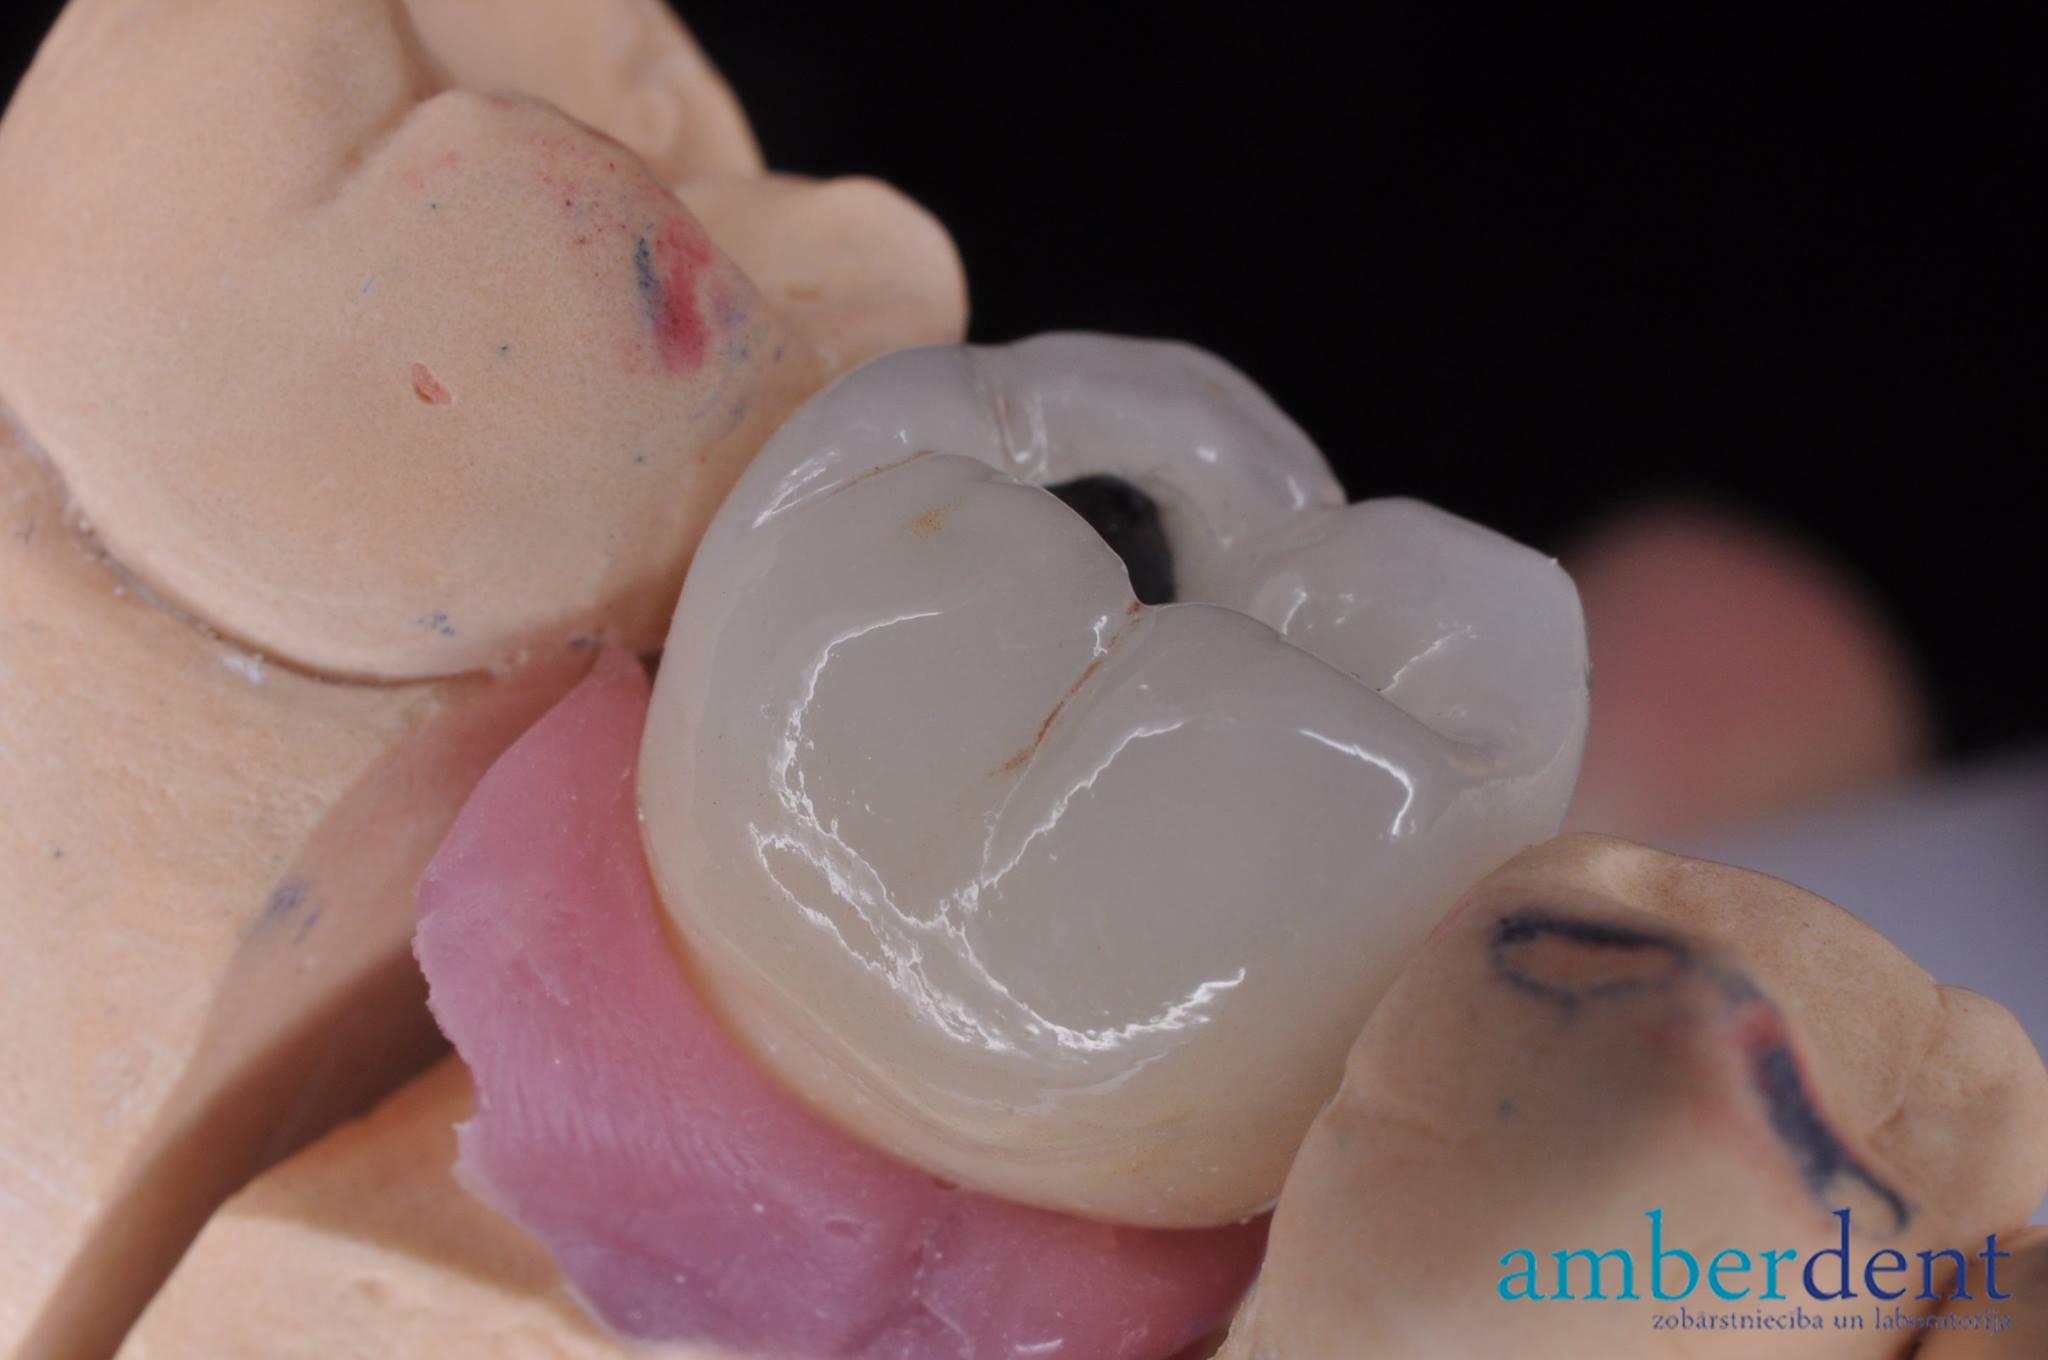 Metālkeramikas kronis uz implanta